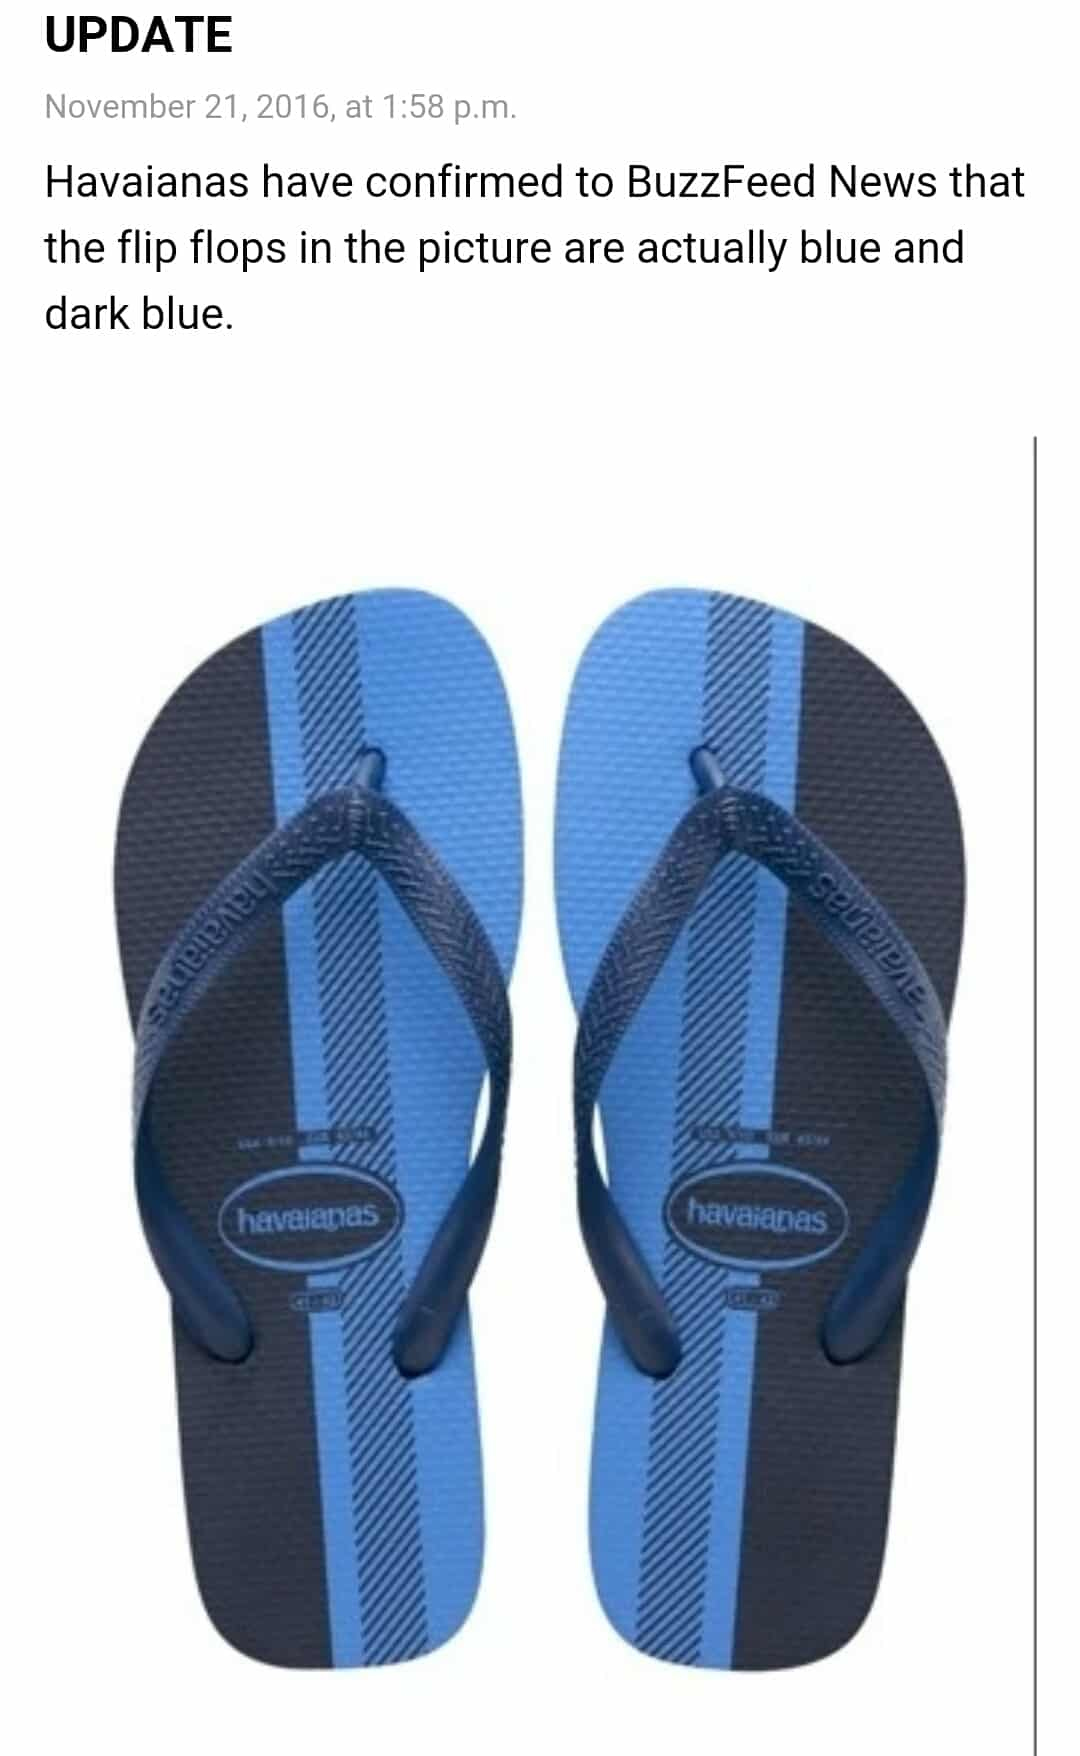 Buzzfeed Havaianas Flip-Flops colours